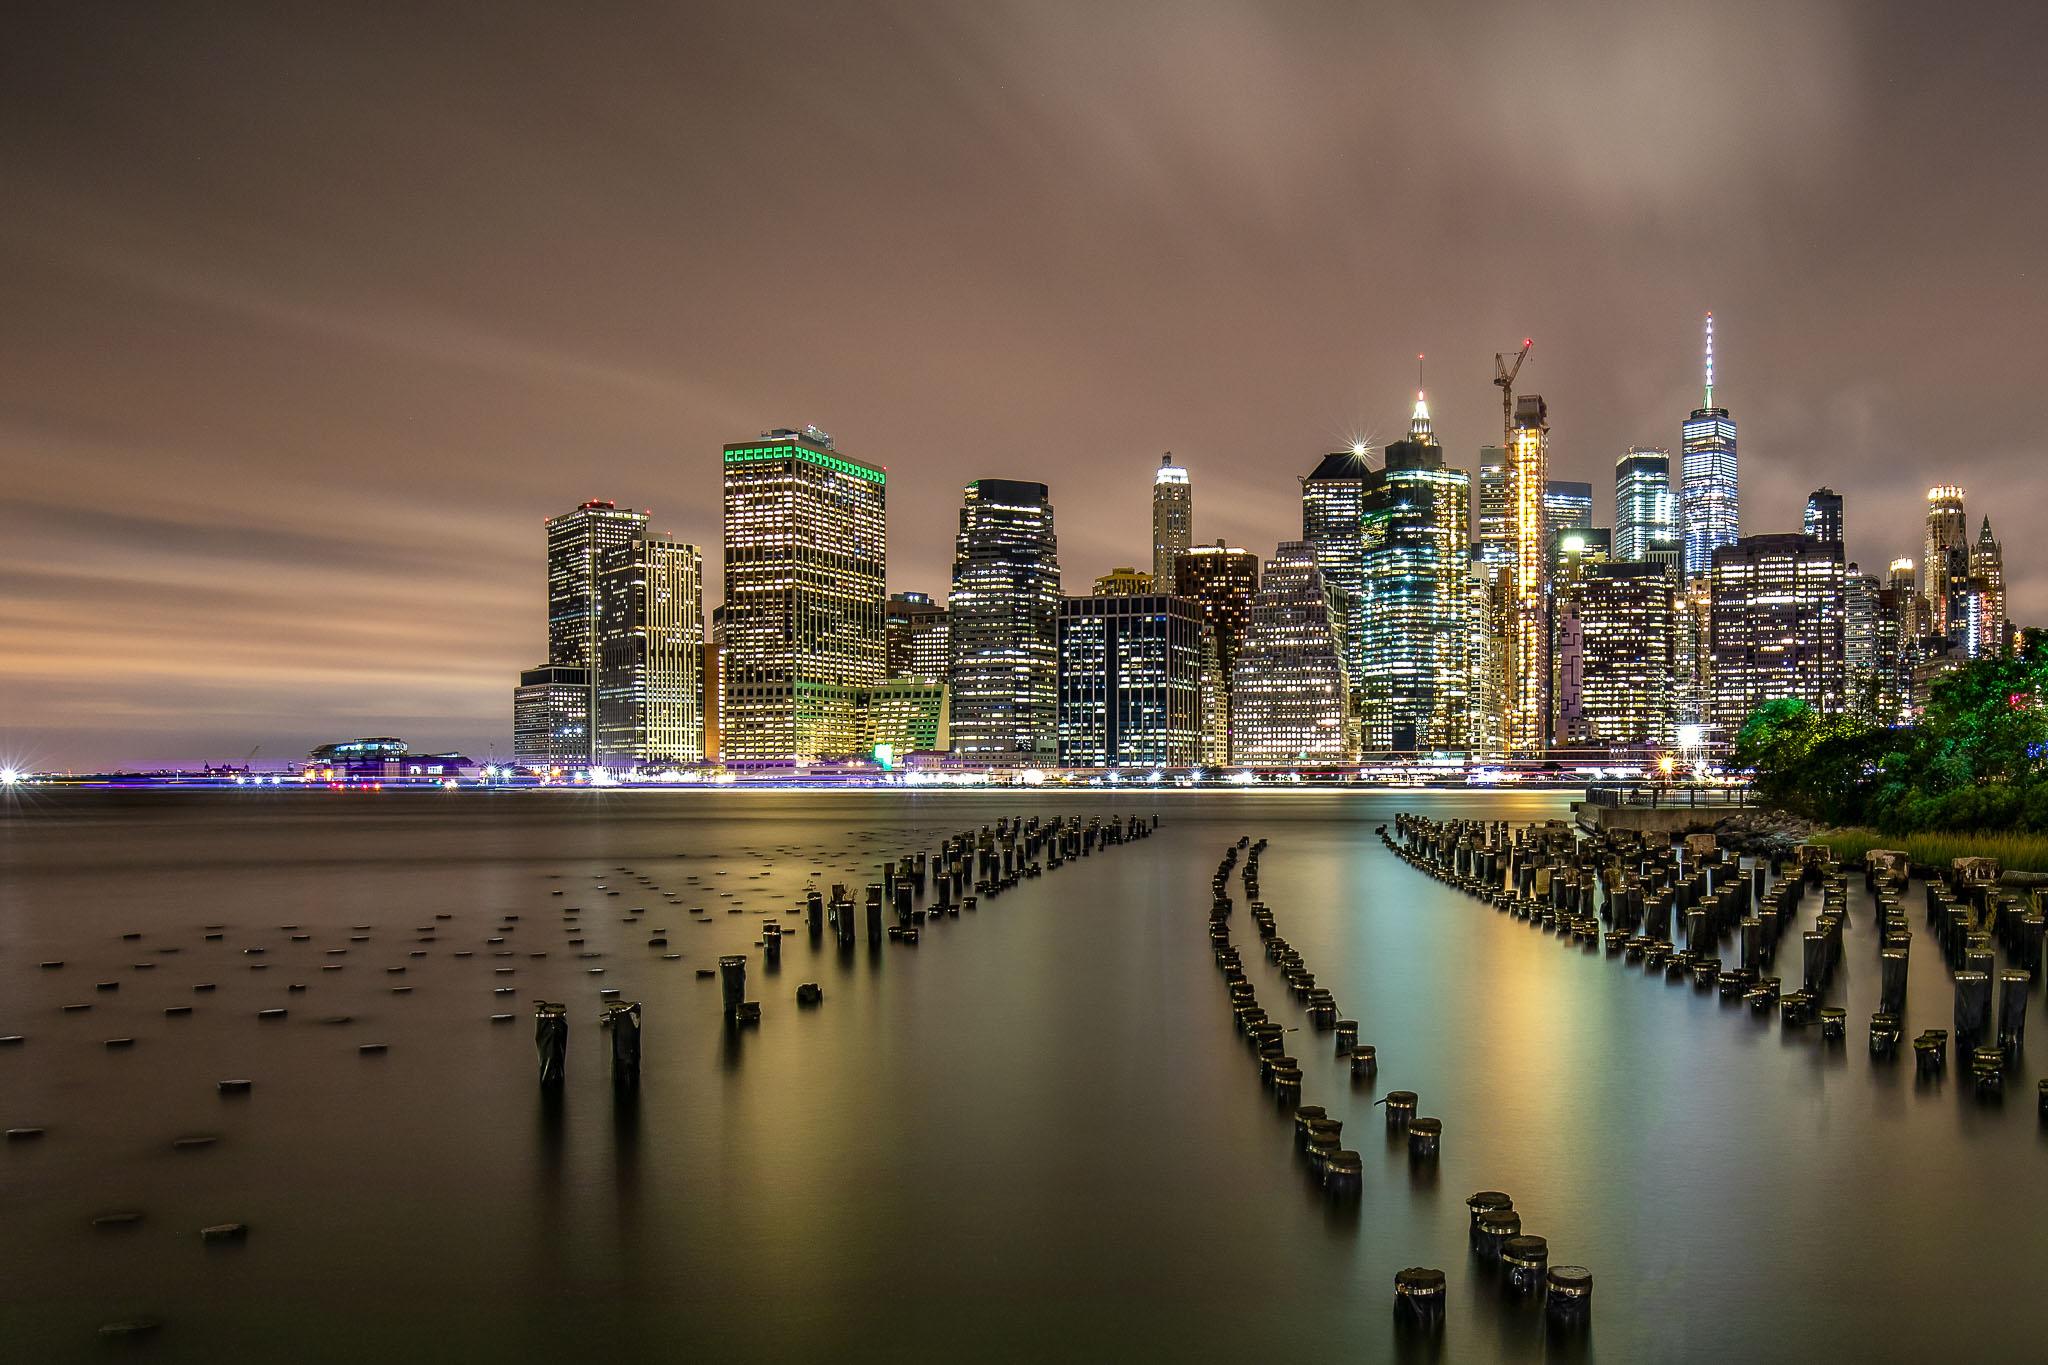 Brooklyn Pier 1 at night